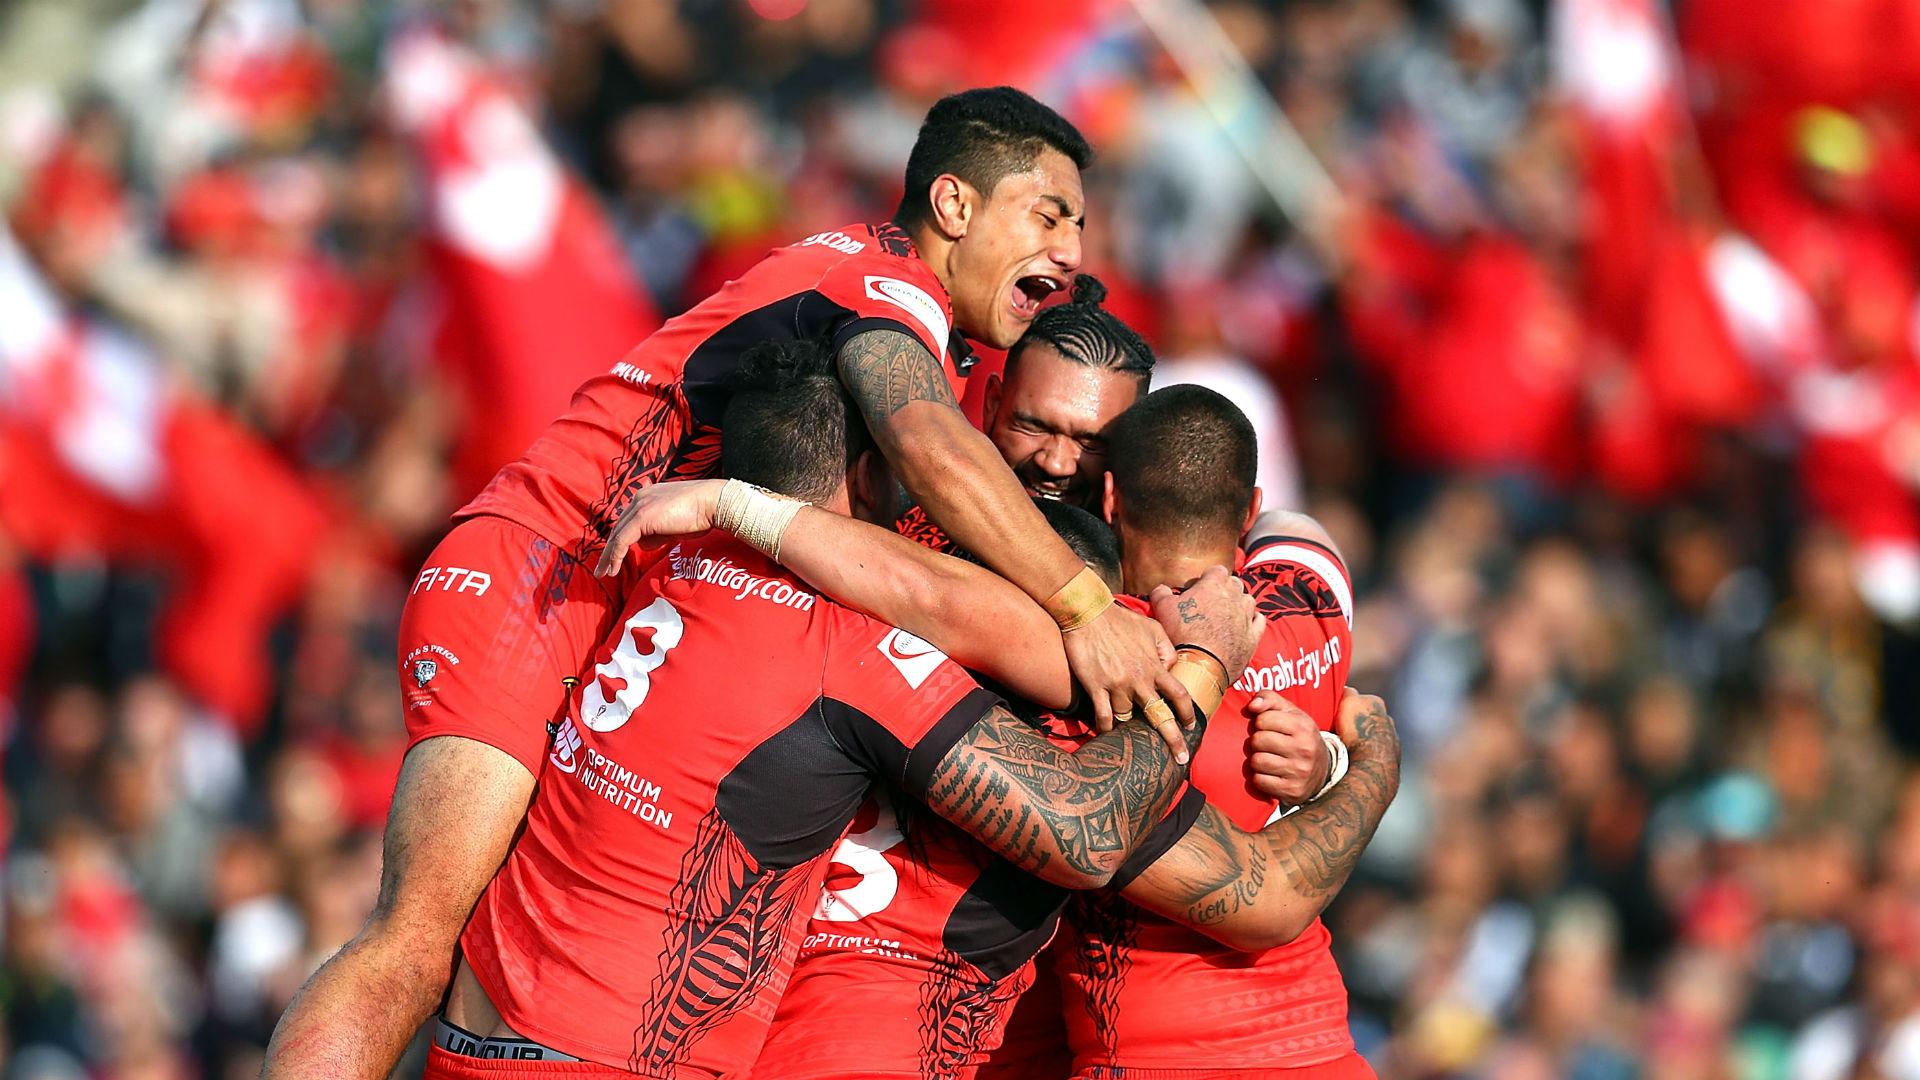 Tonga v Australia Test confirmed, Tonga v New Zealand announced